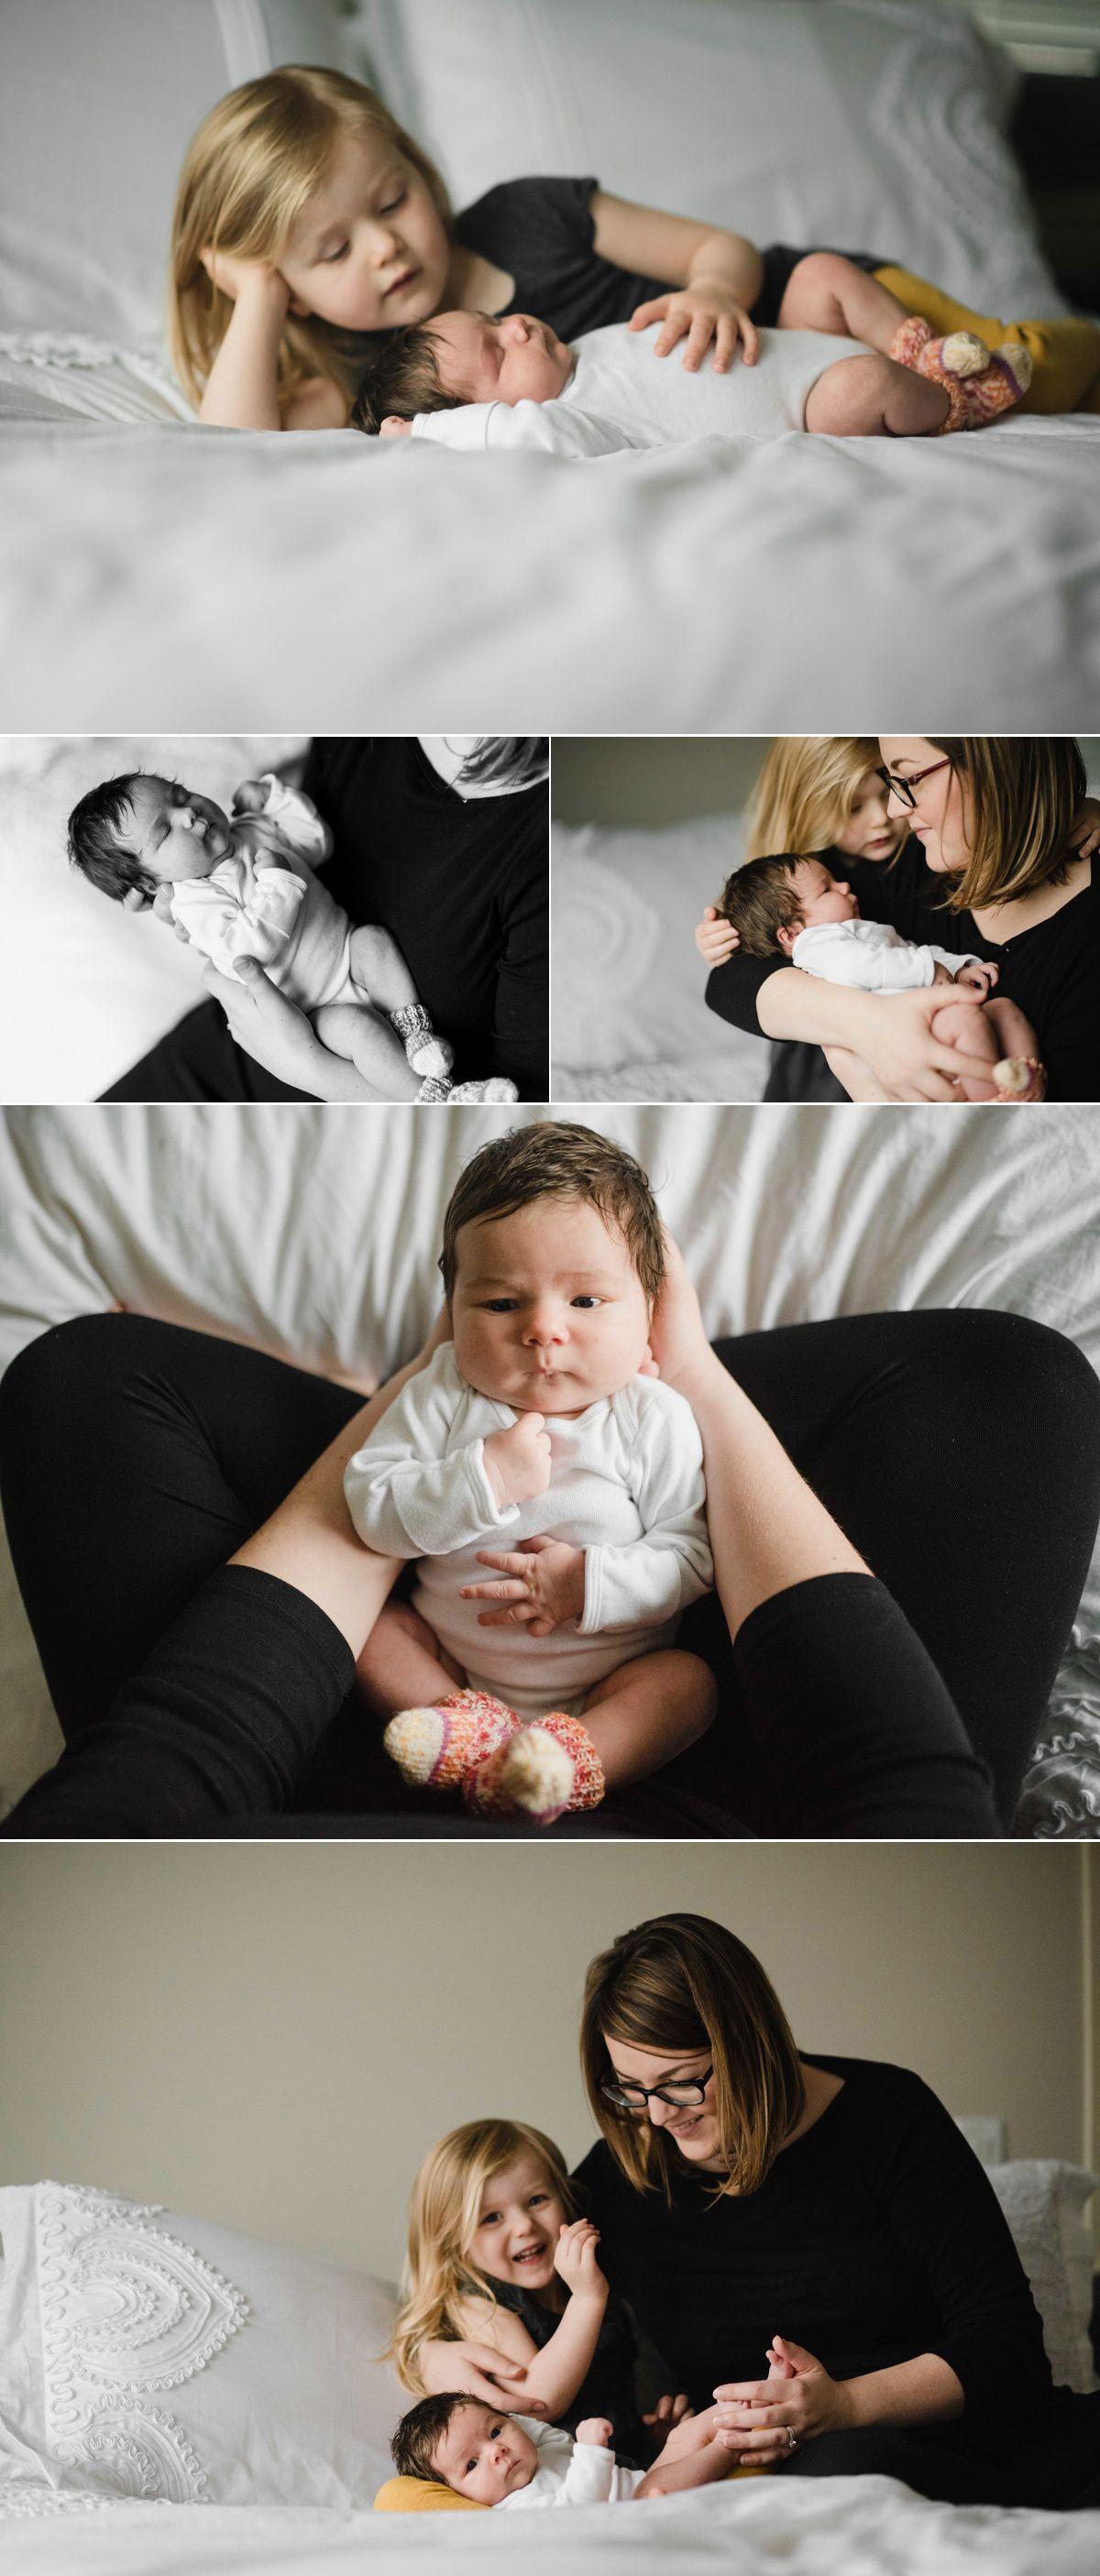 In home newborn session newborn photography in home photography session photography session baby session baby photography session baby photography